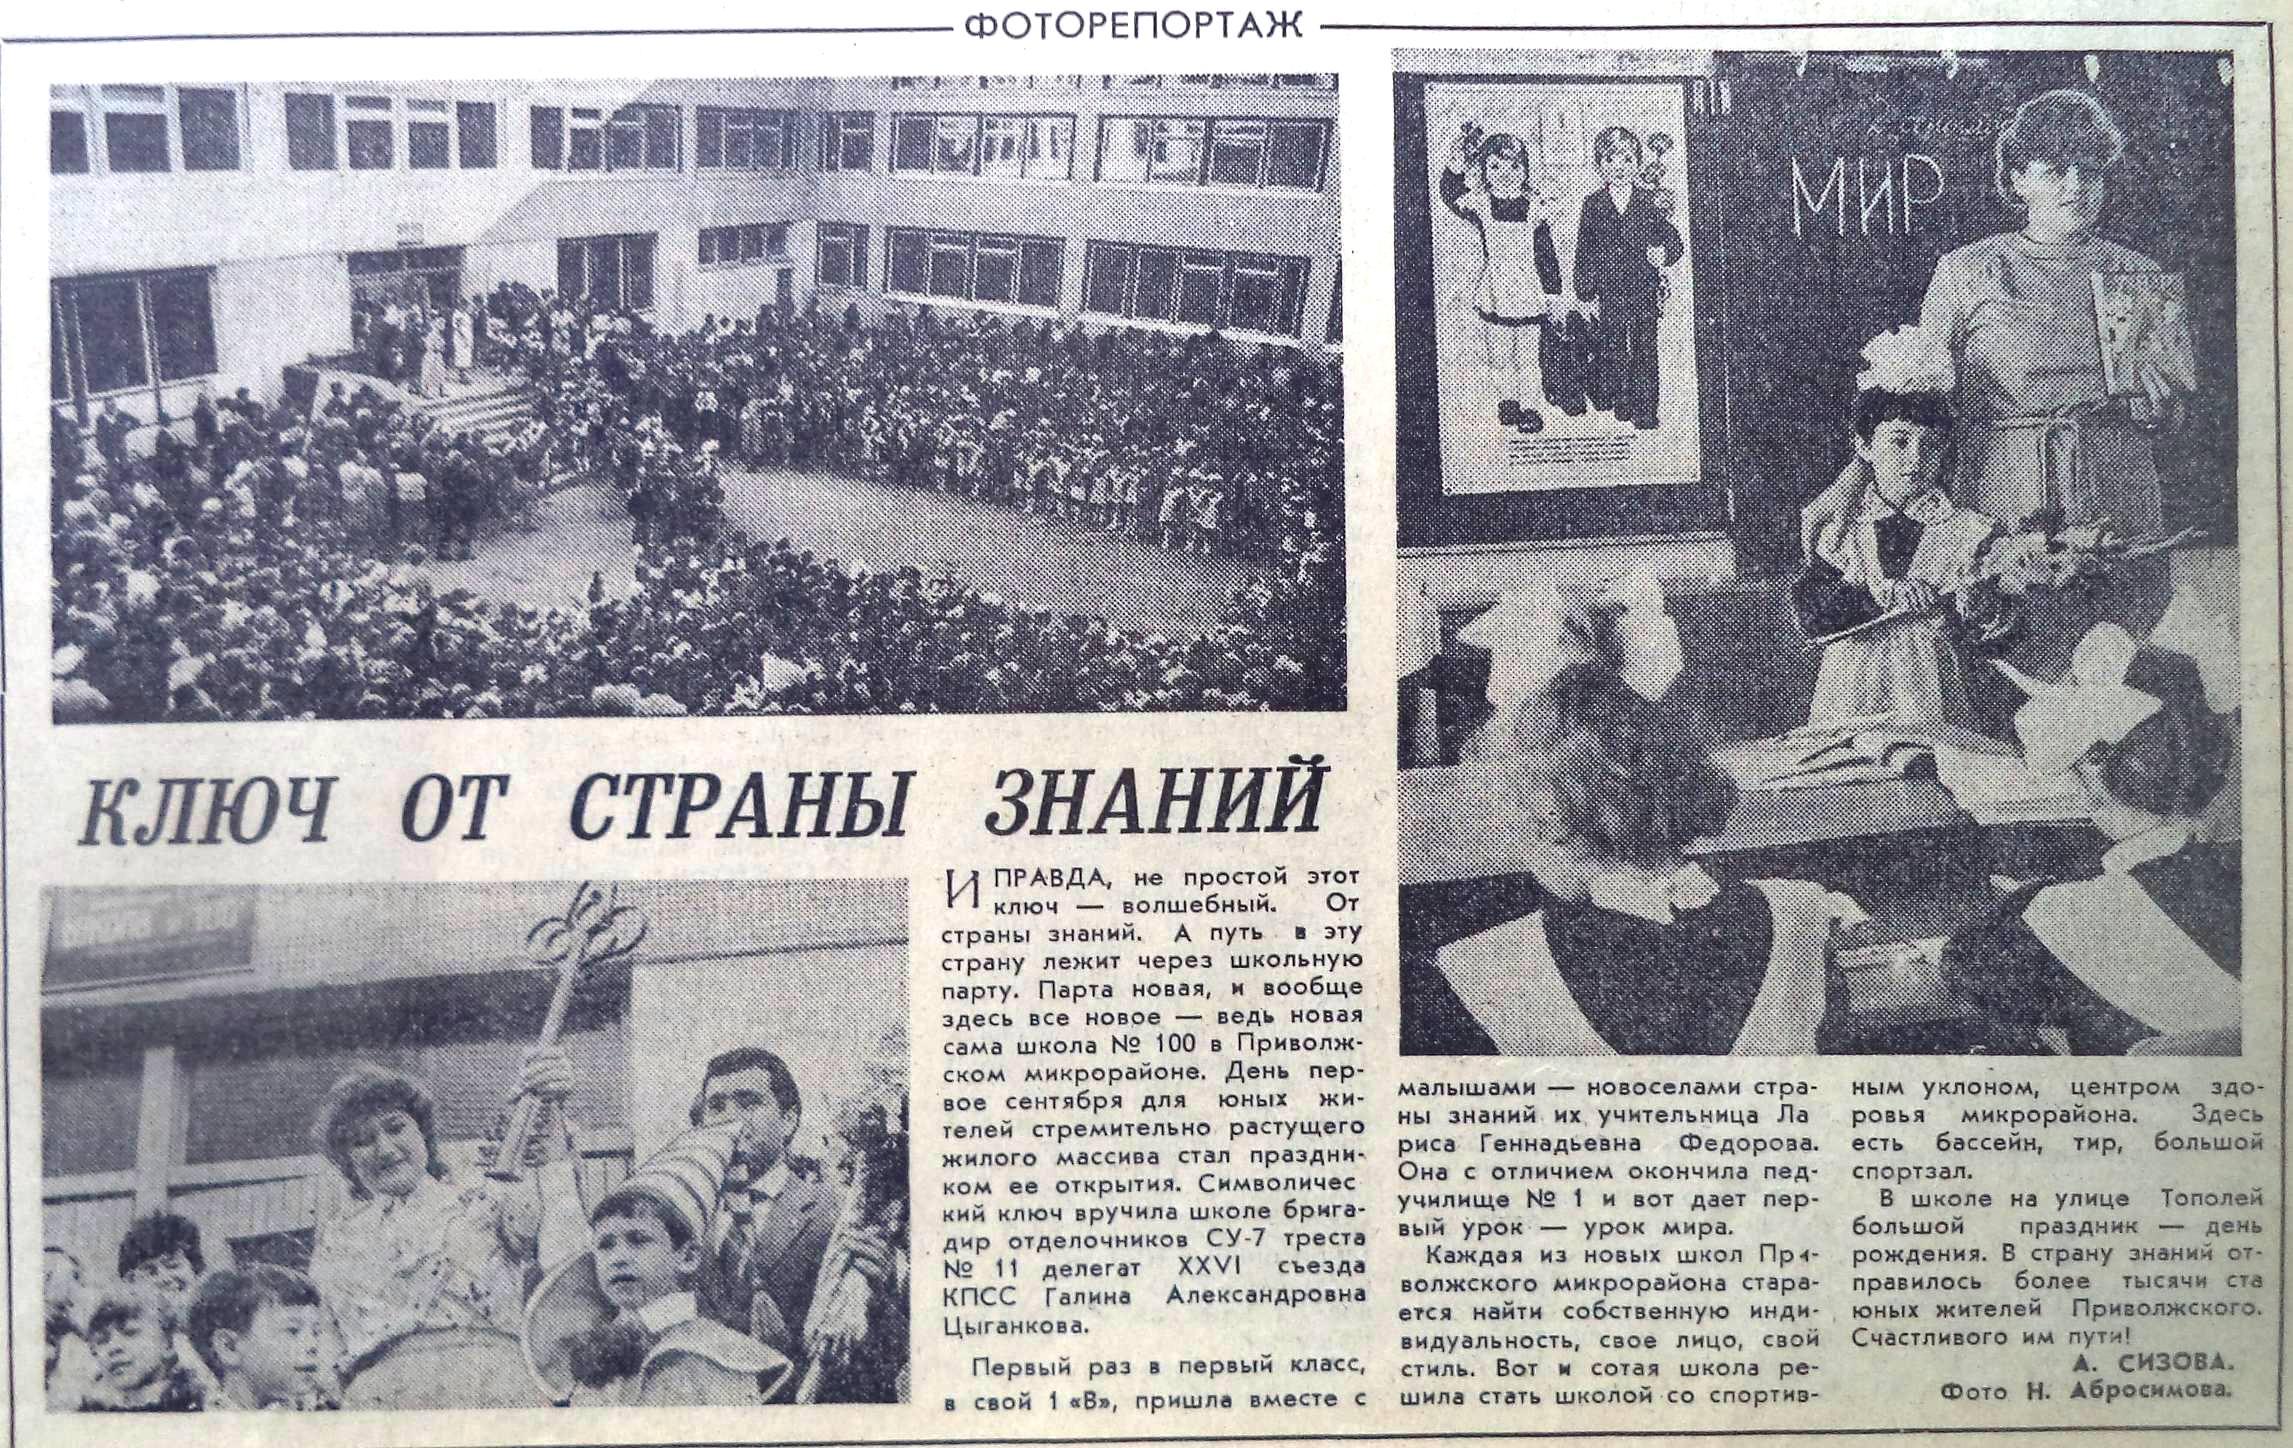 Тополей-ФОТО-08-ВЗя-1985-09-03-новая шк. № 100 на ул. Тополей-min